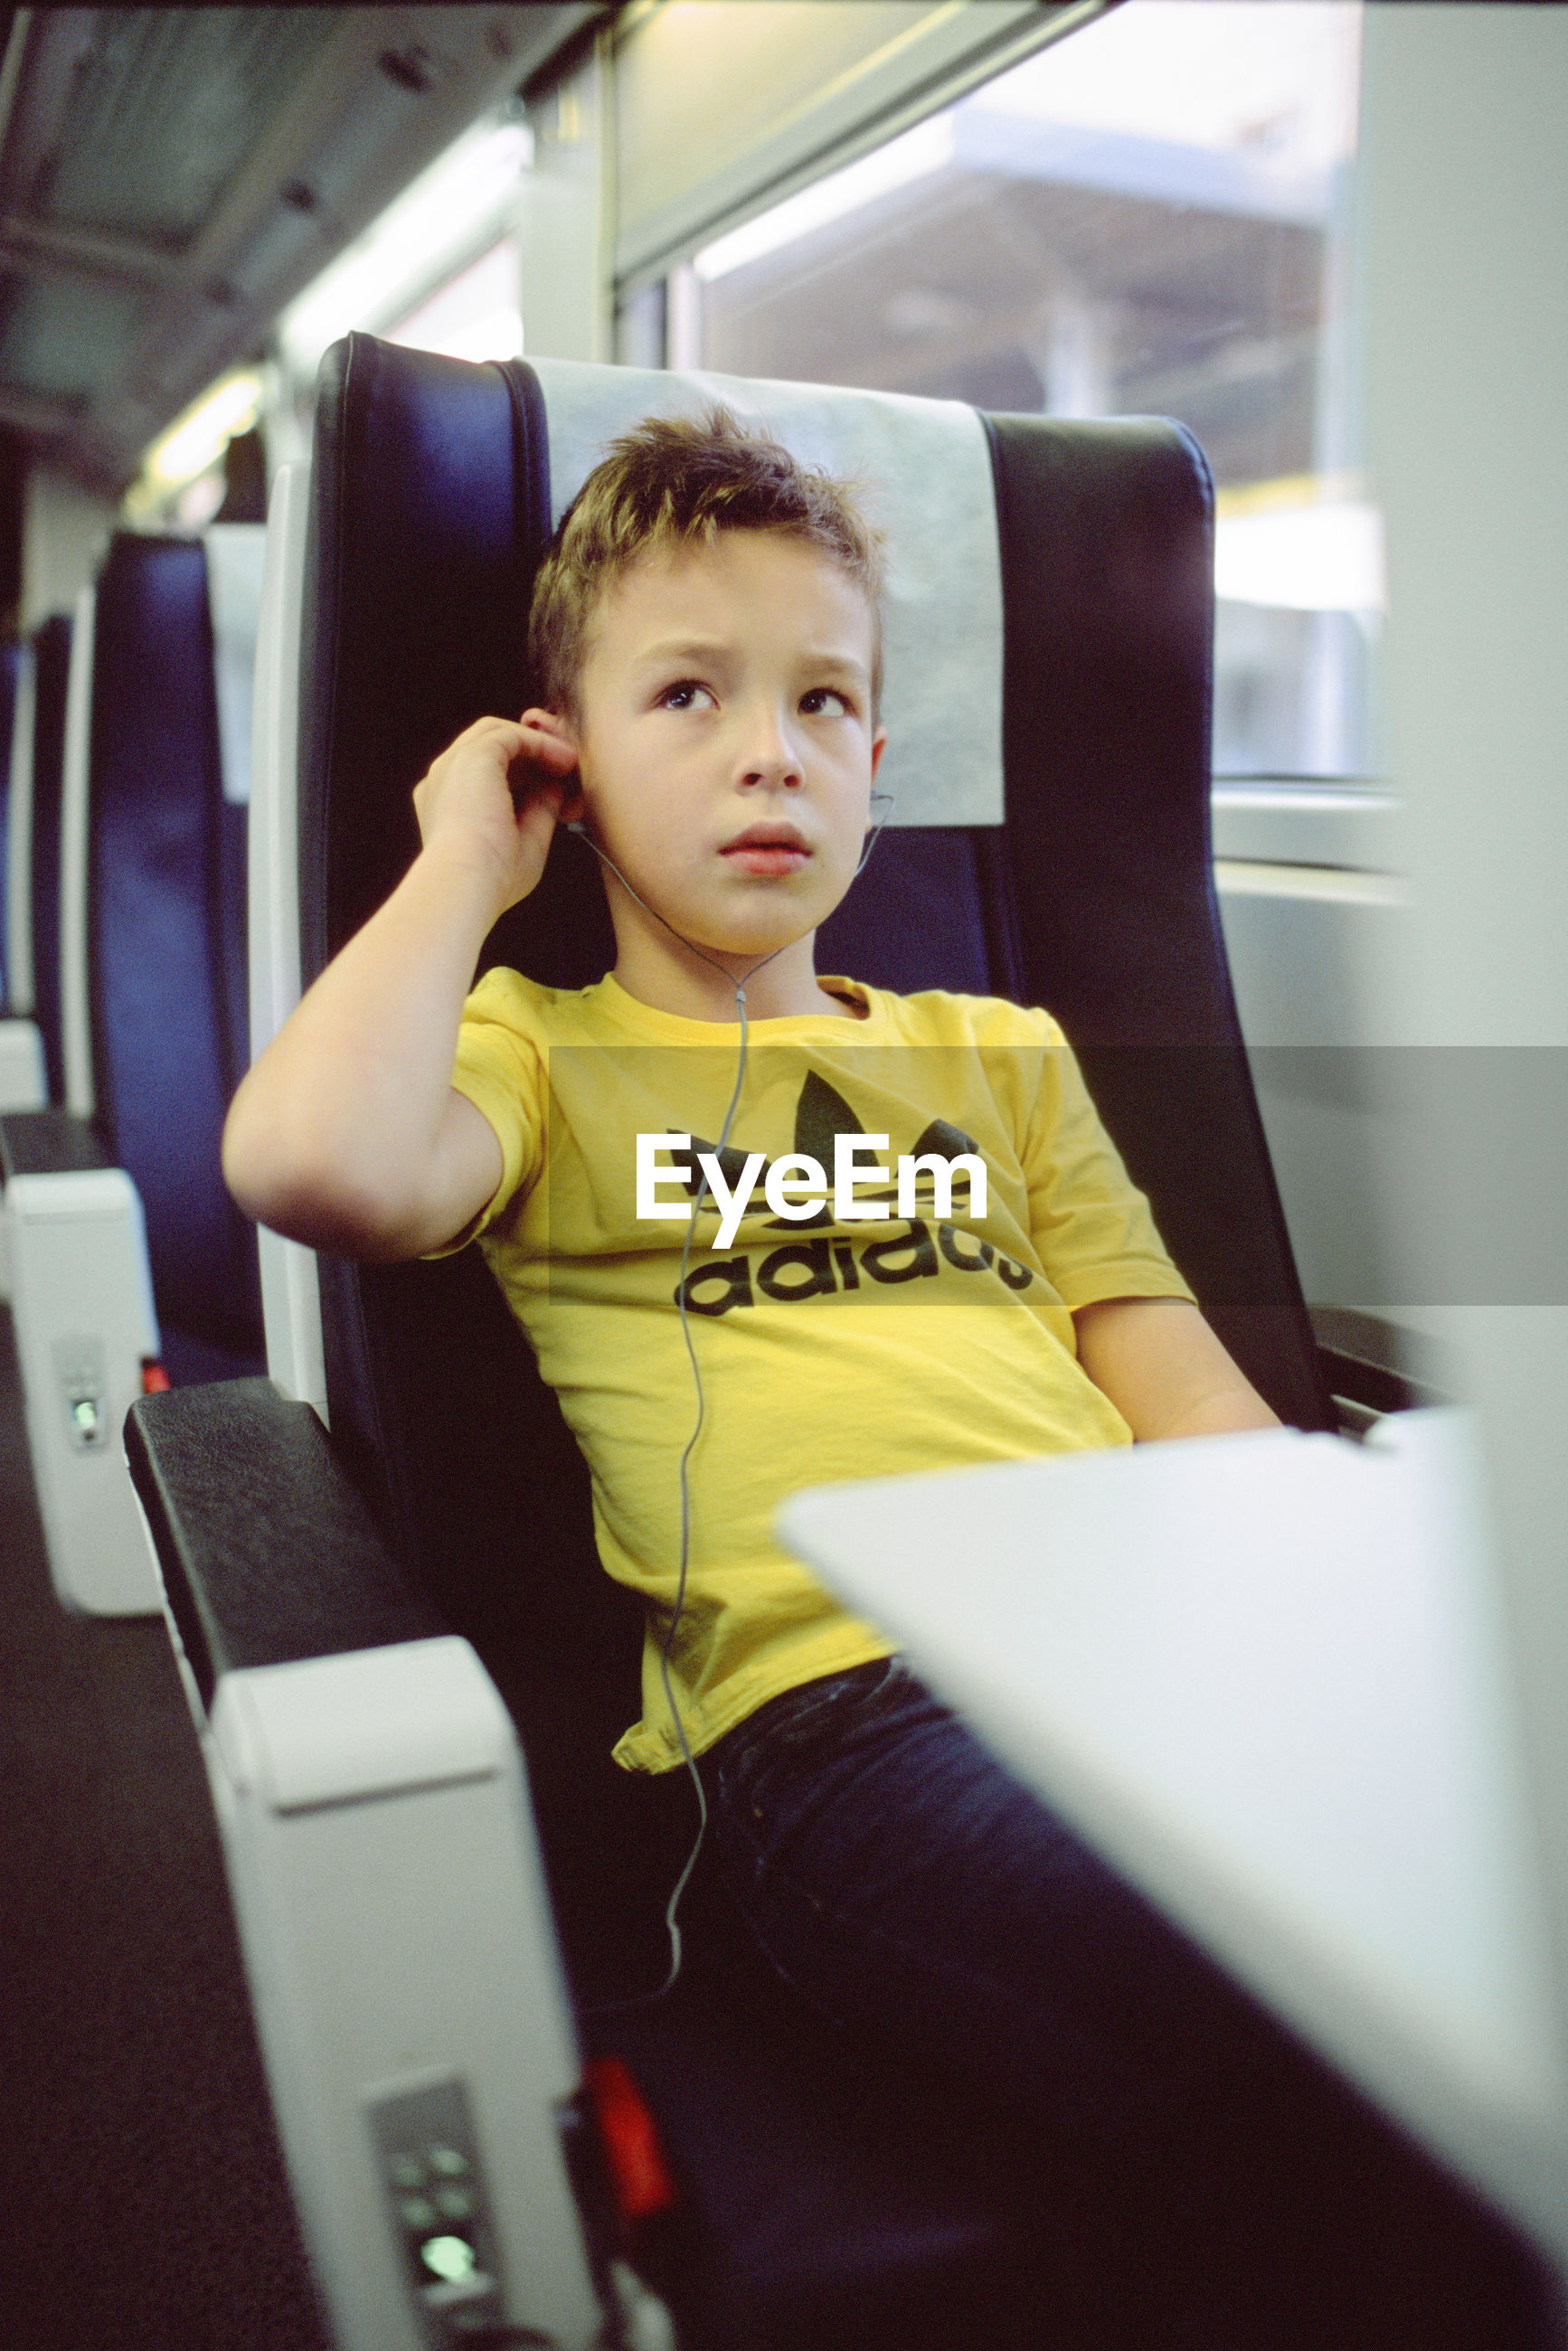 REAR VIEW OF BOY SITTING ON SEAT IN TRAIN